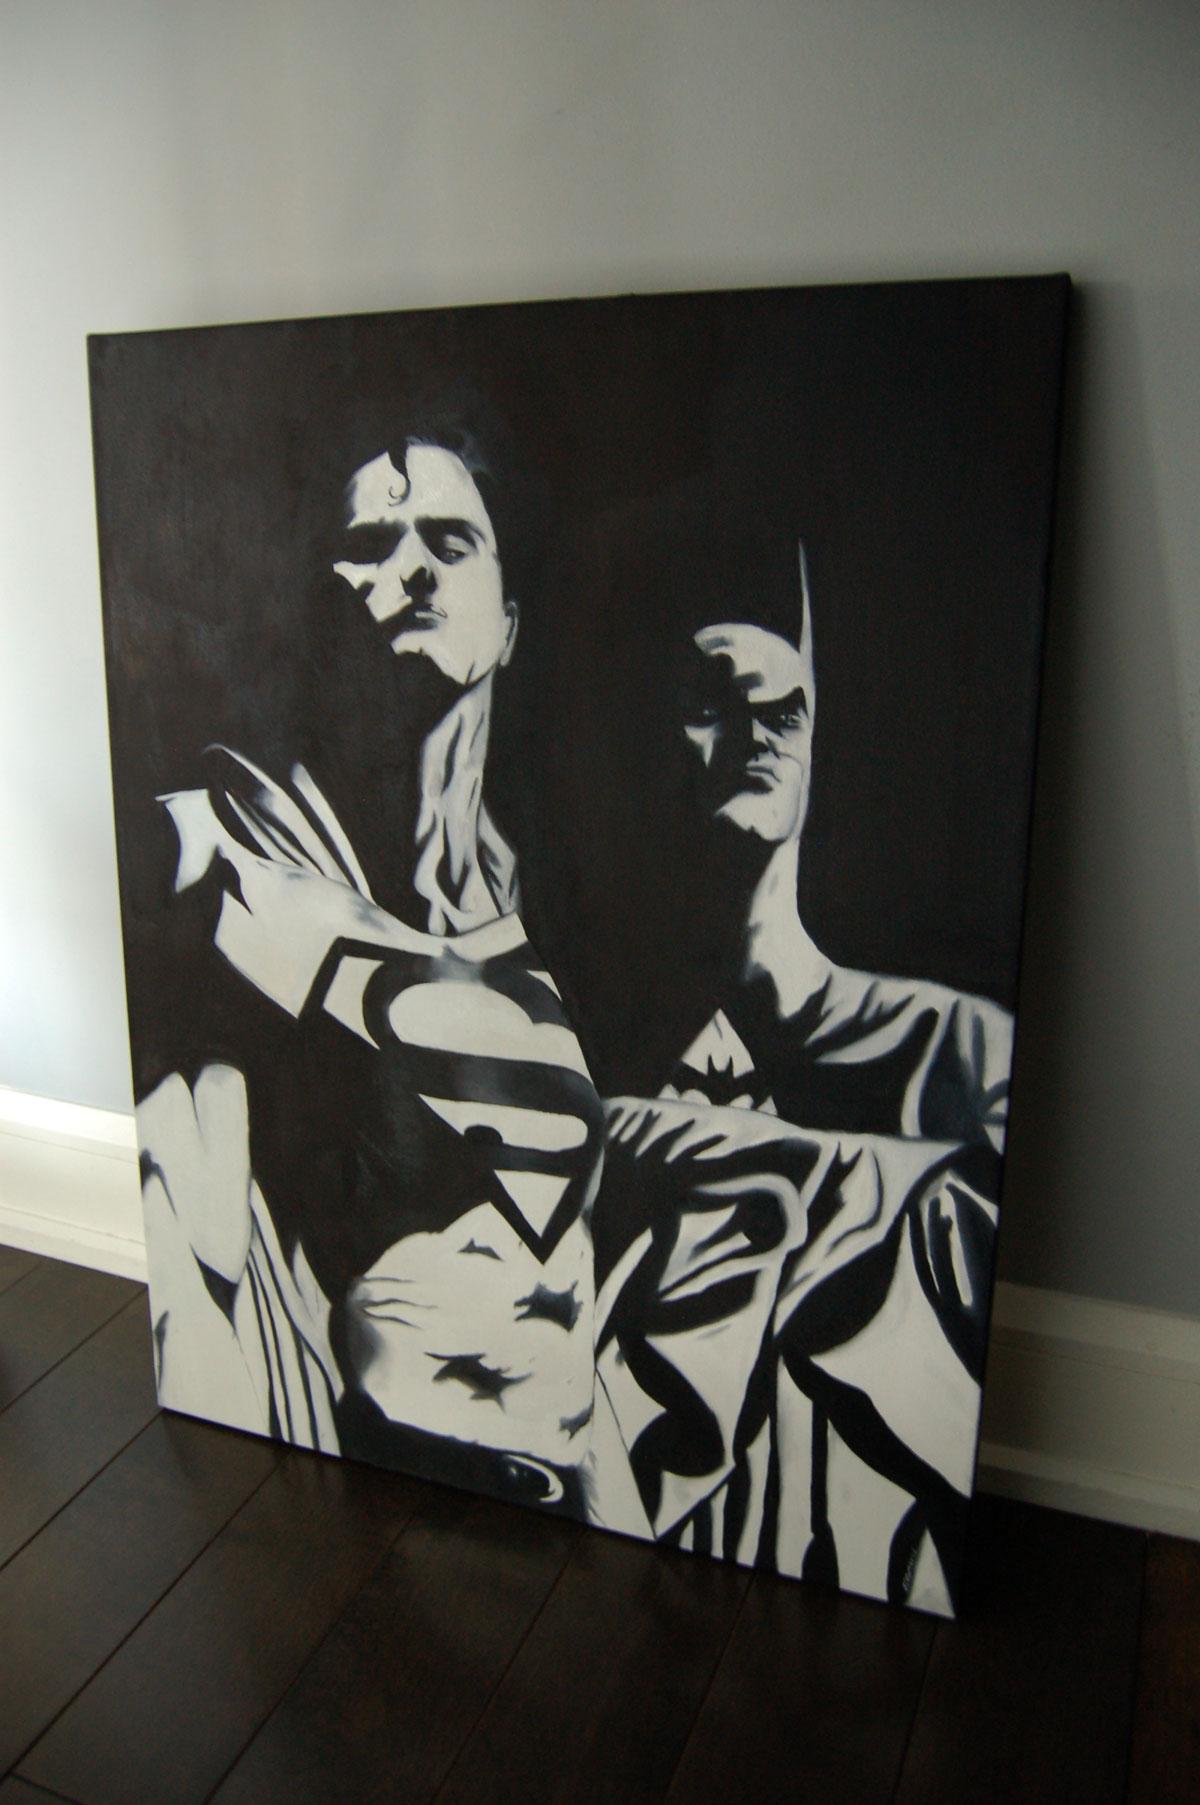 kb-peinture-superman-batman-karine-bujold-contexte-mars-14